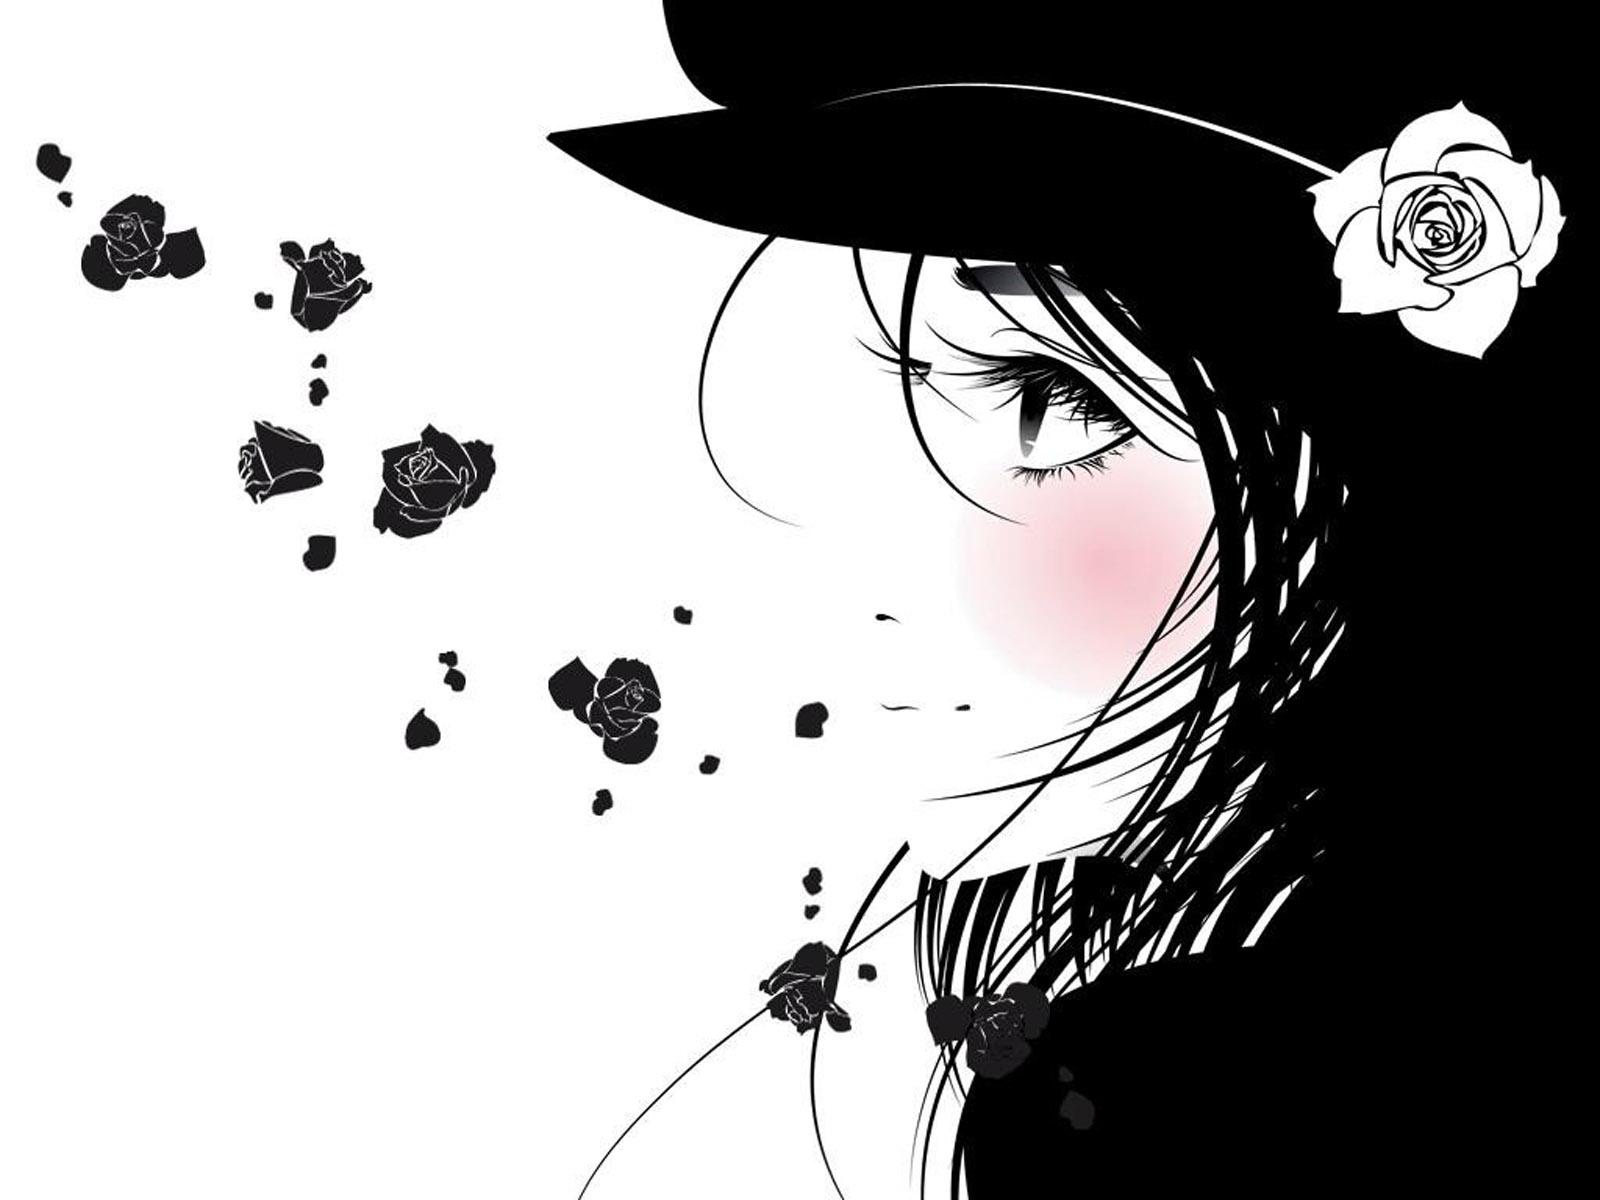 Anime Emo Wallpaper Emo Wallpapers of Emo Boys and Girls 1600x1200